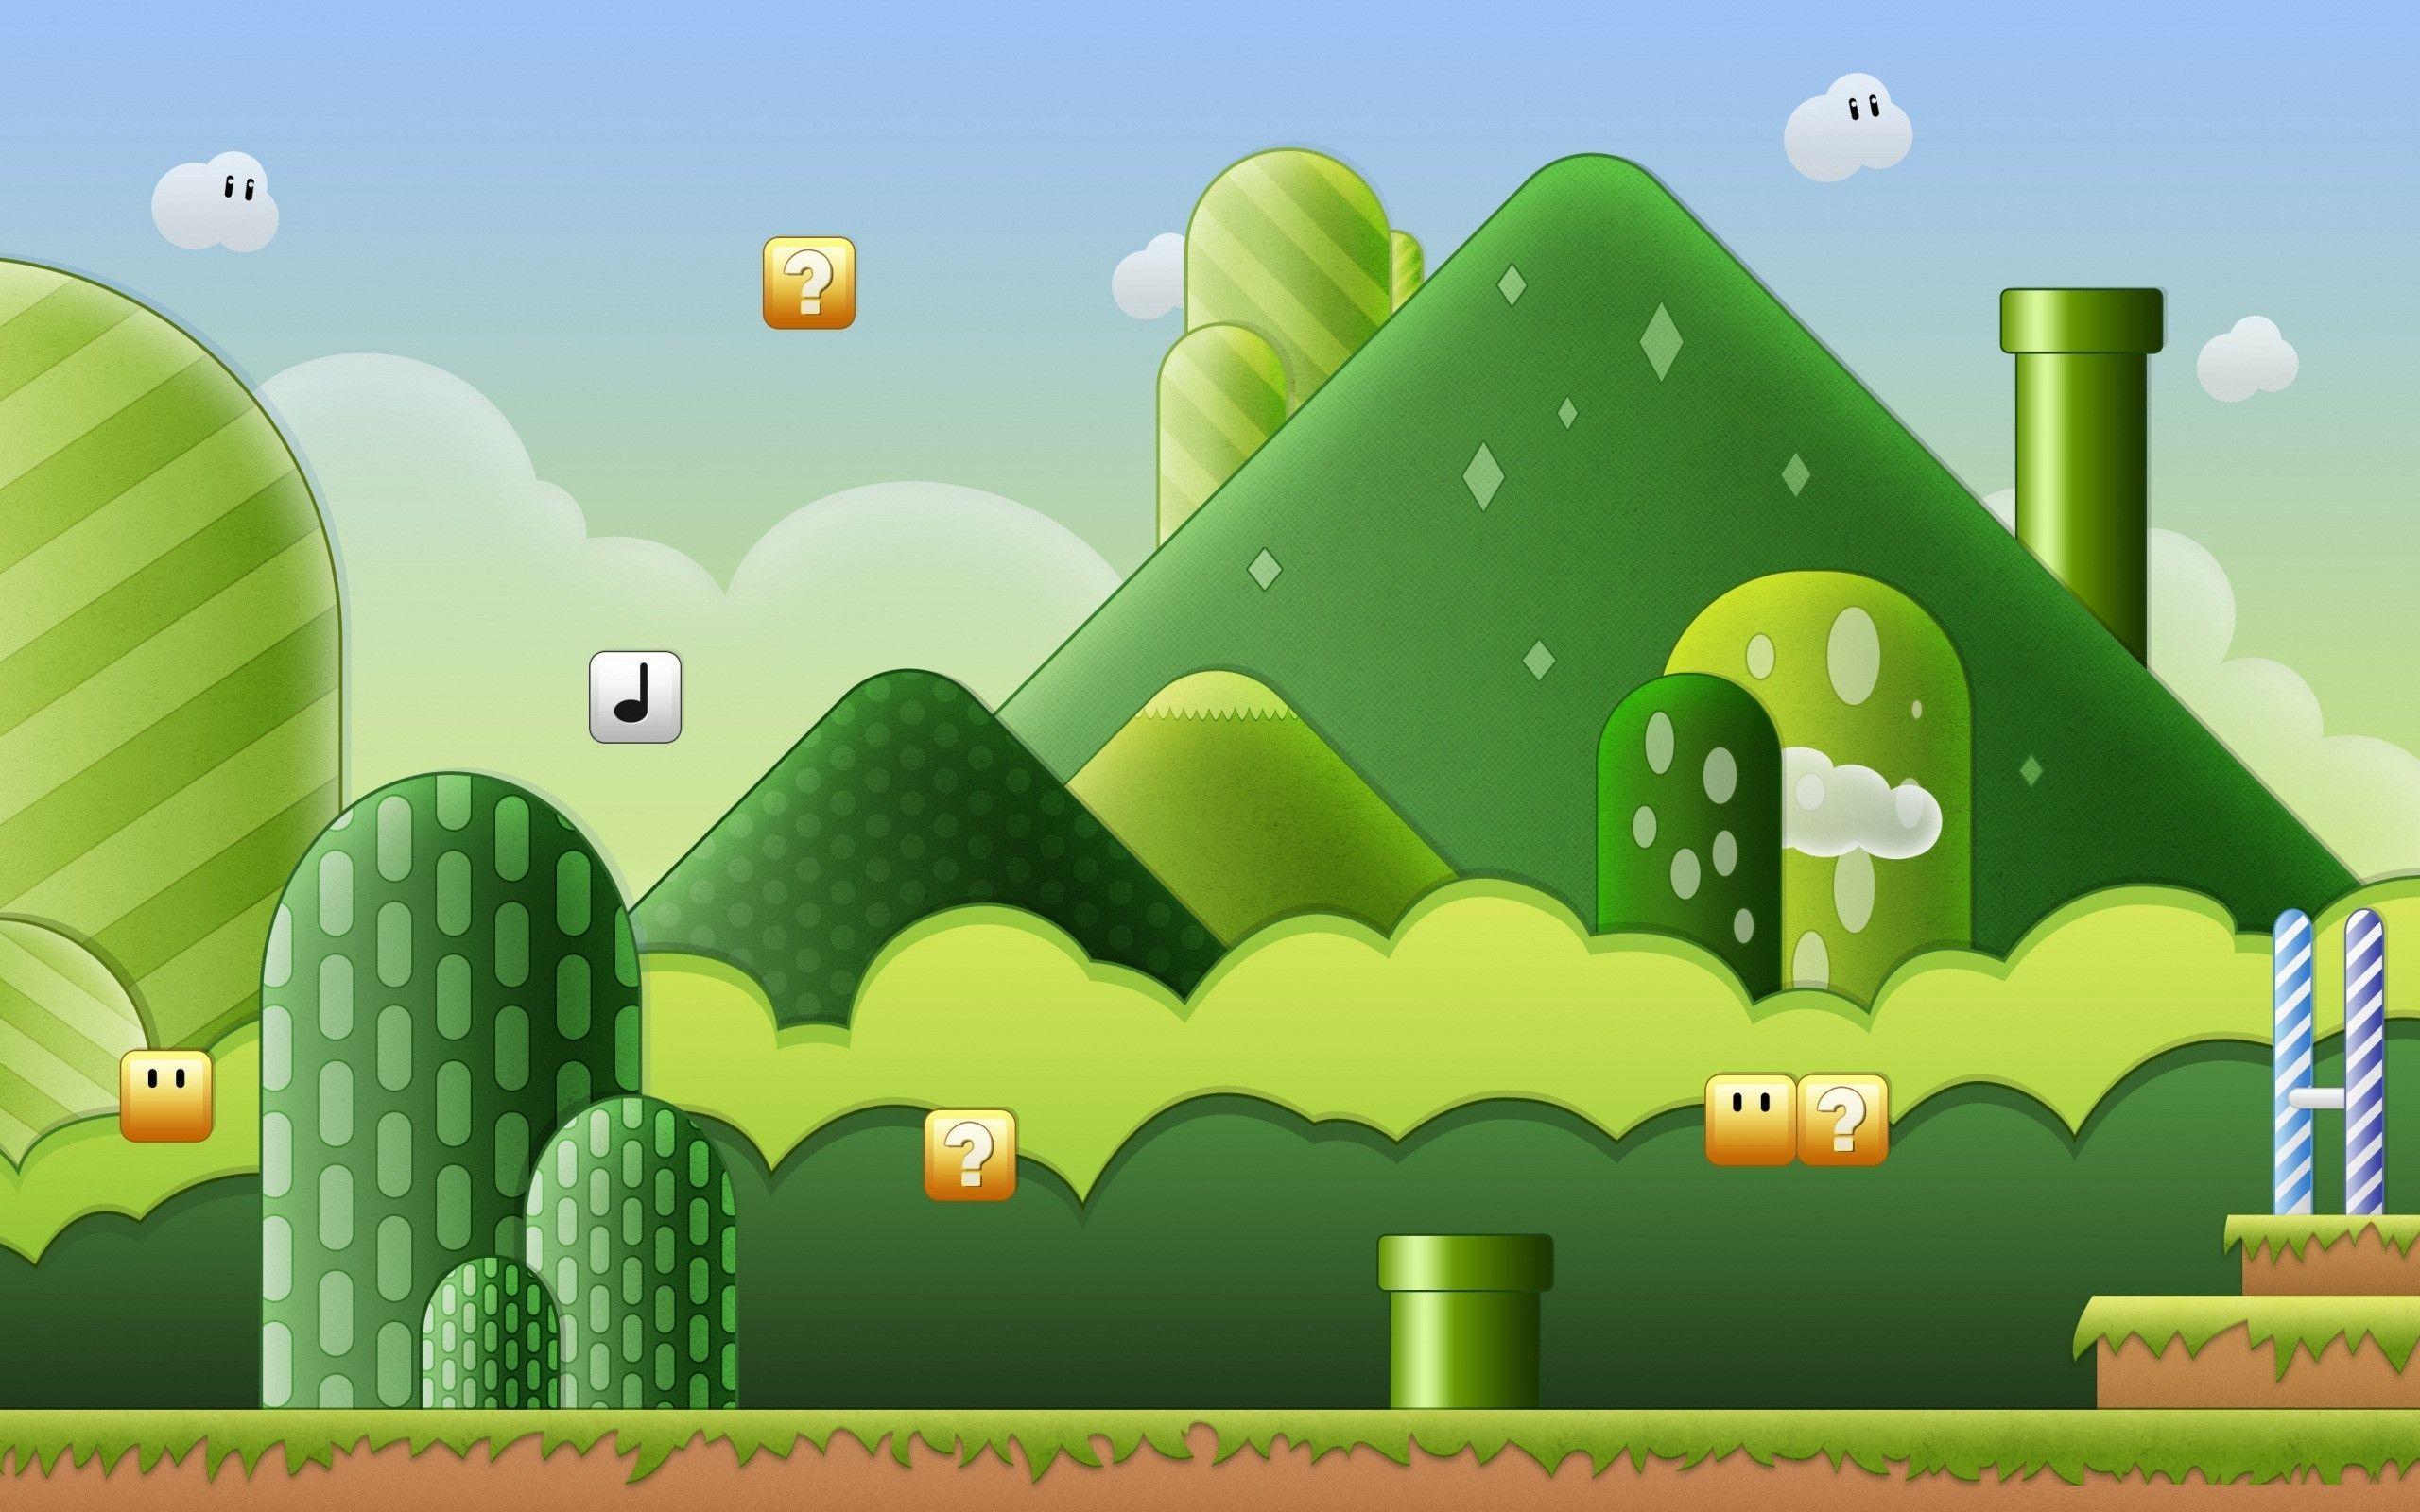 Super Mario Backgrounds Wallpaperwiki World Wallpaper Game Background Super Mario World